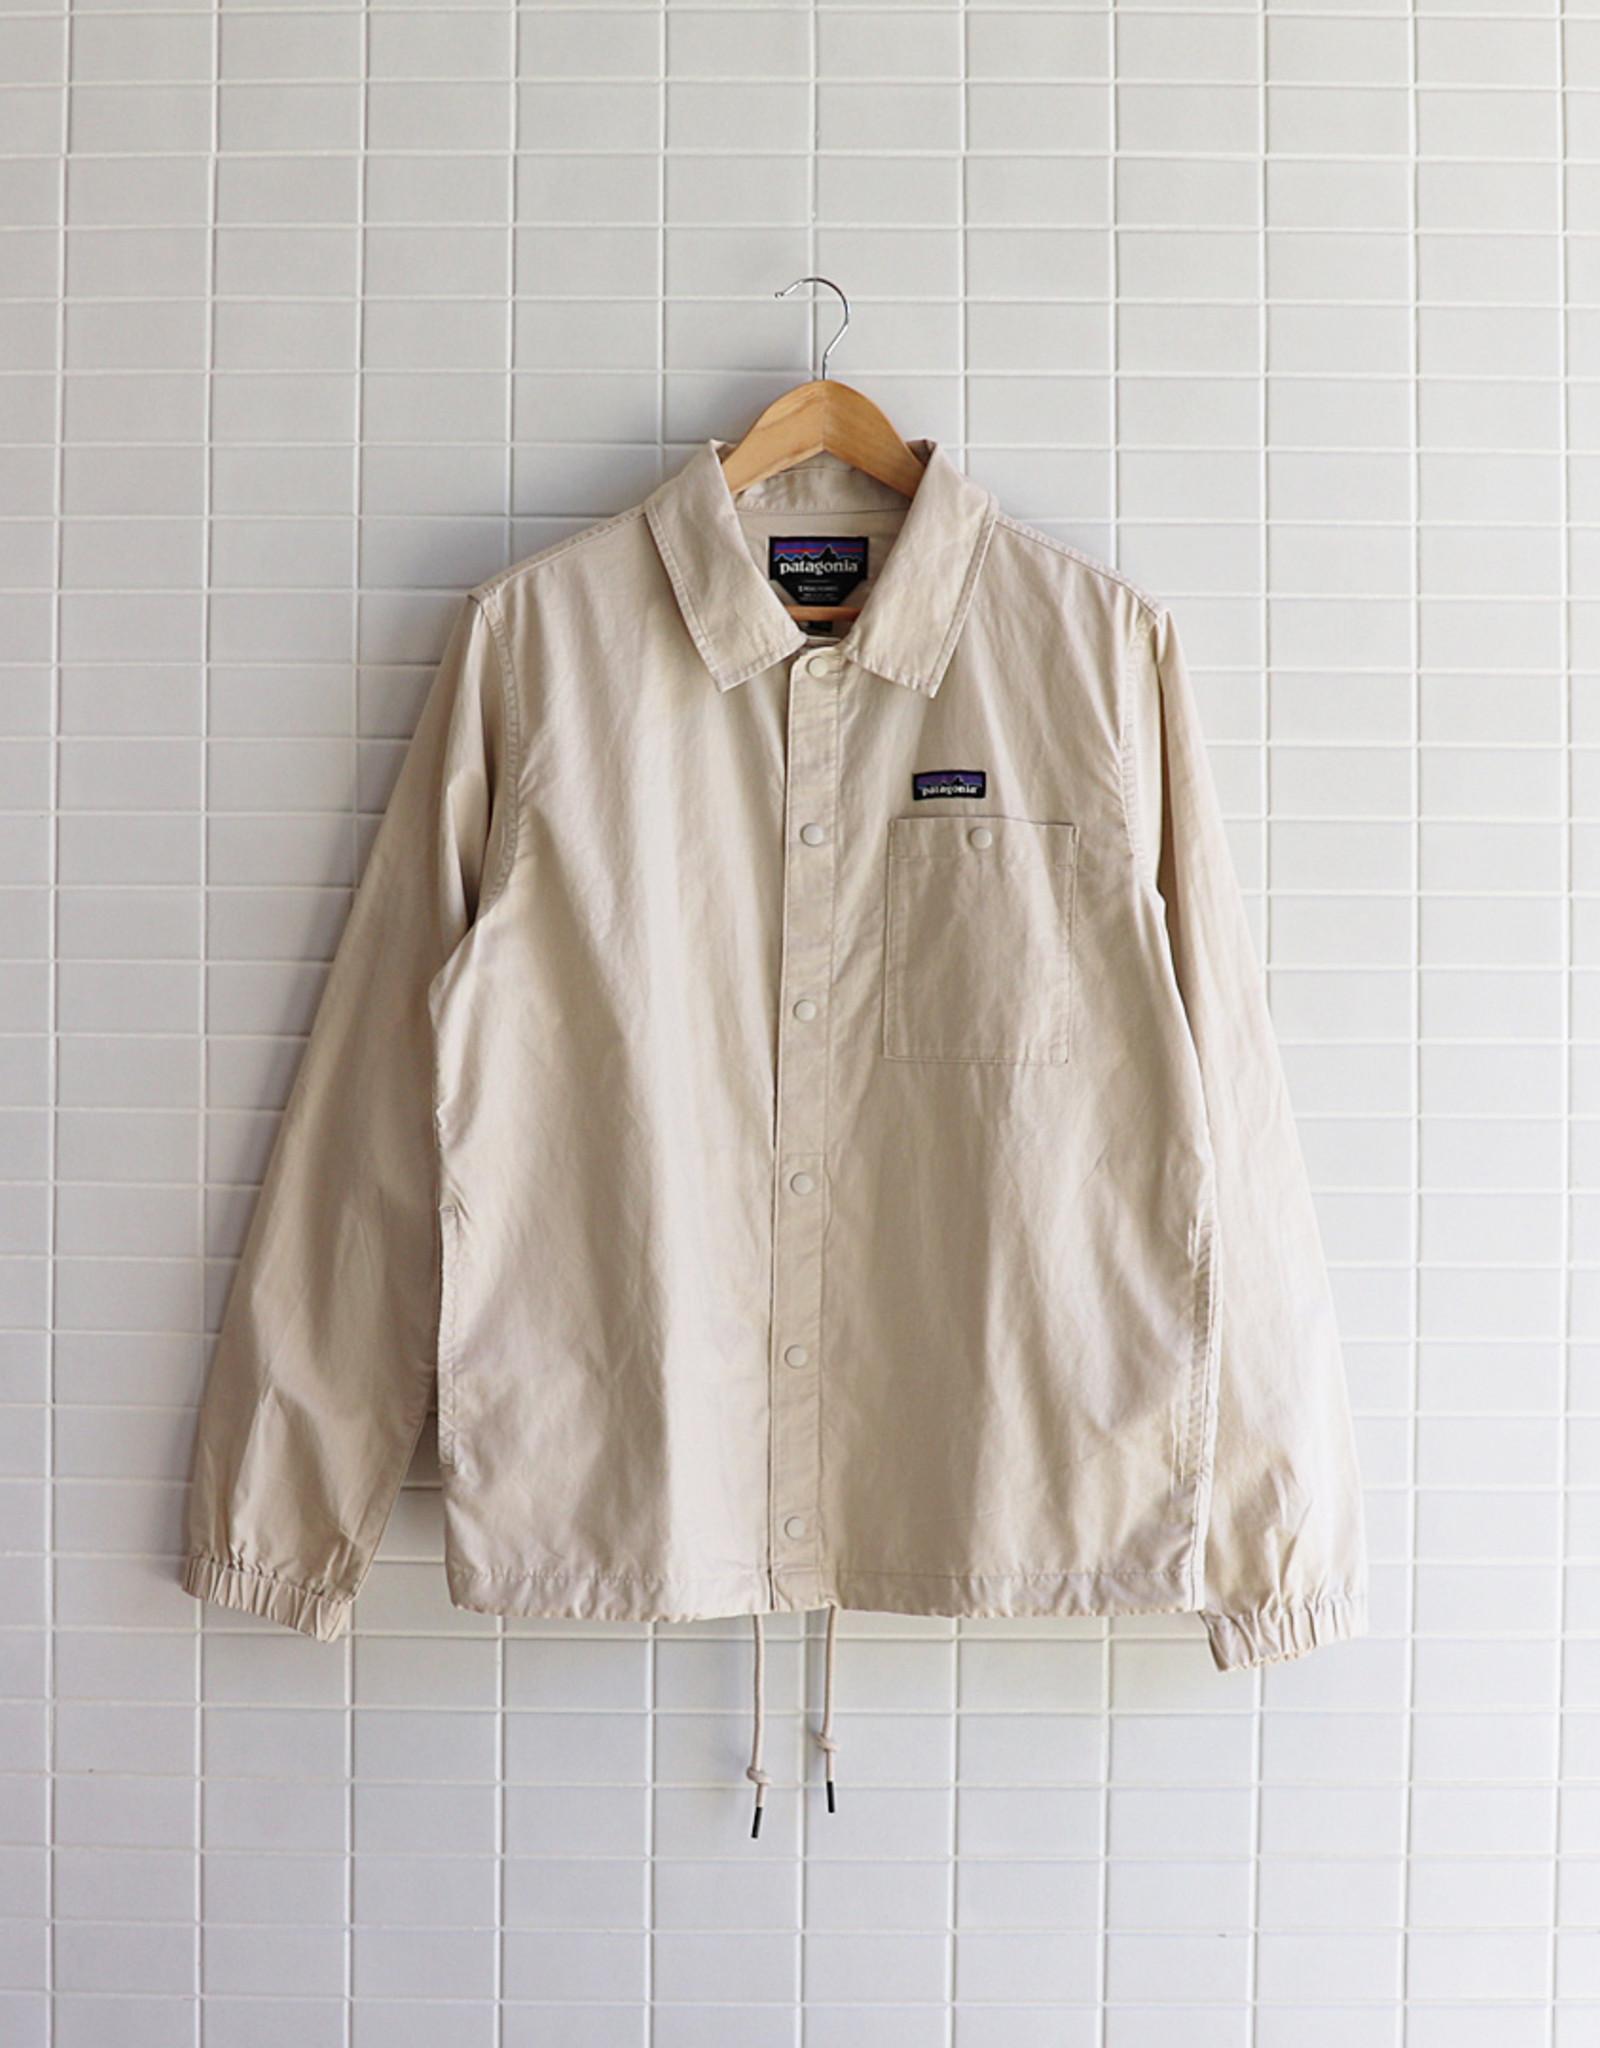 Patagonia - All-Wear Hemp Coach Jacket - Pumice